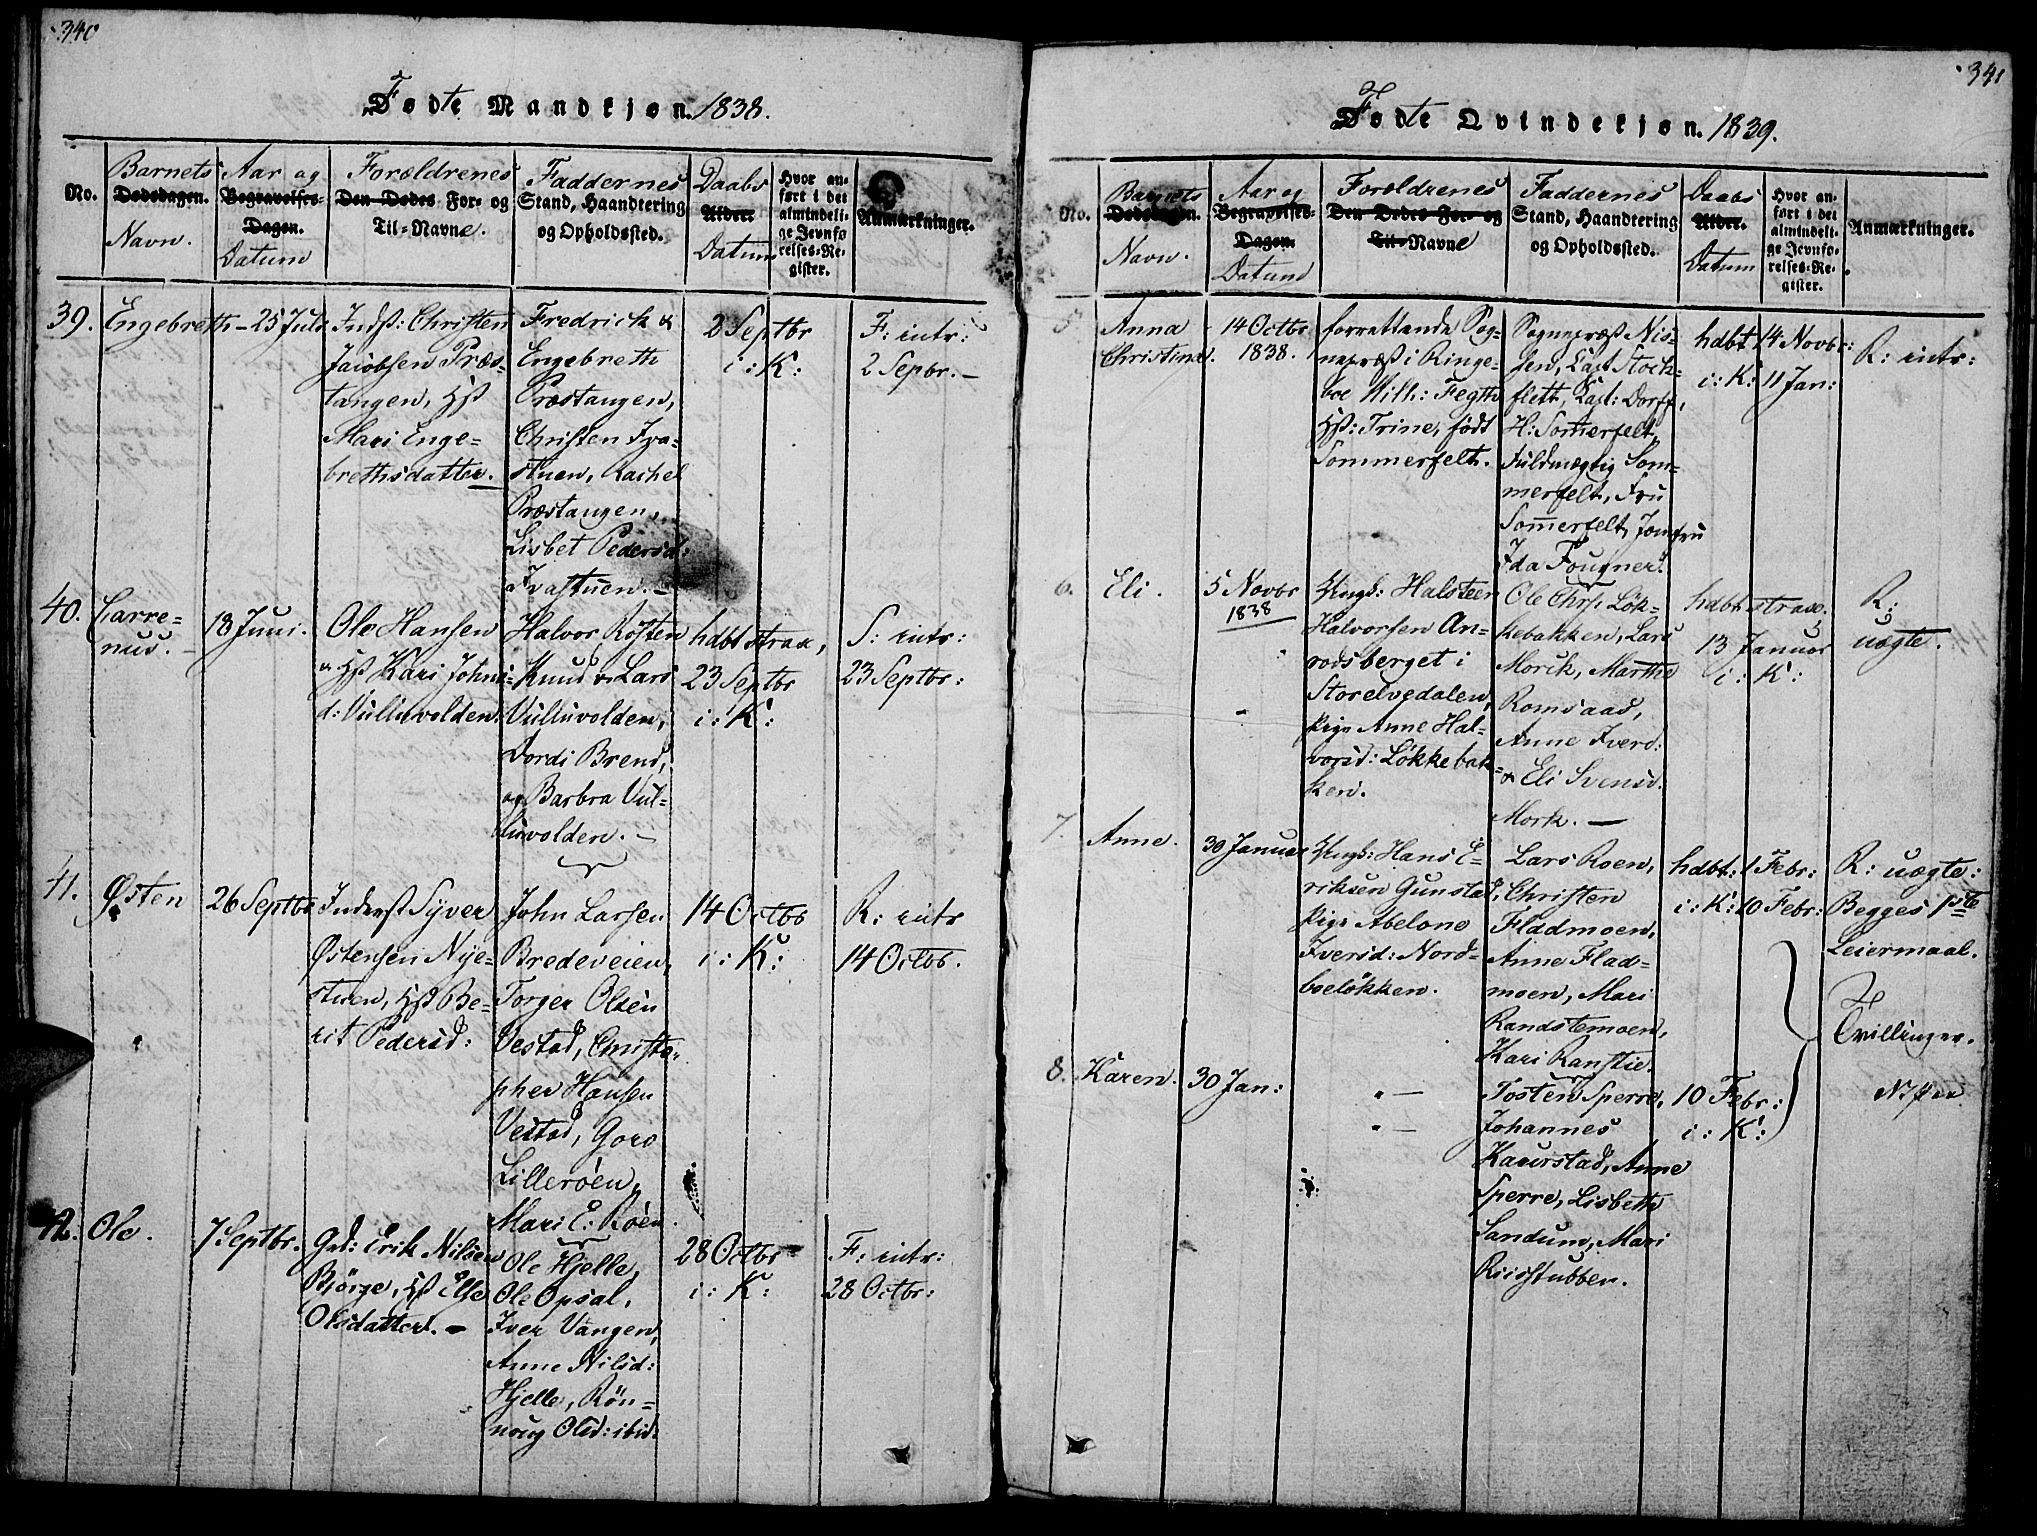 SAH, Ringebu prestekontor, Ministerialbok nr. 4, 1821-1839, s. 340-341